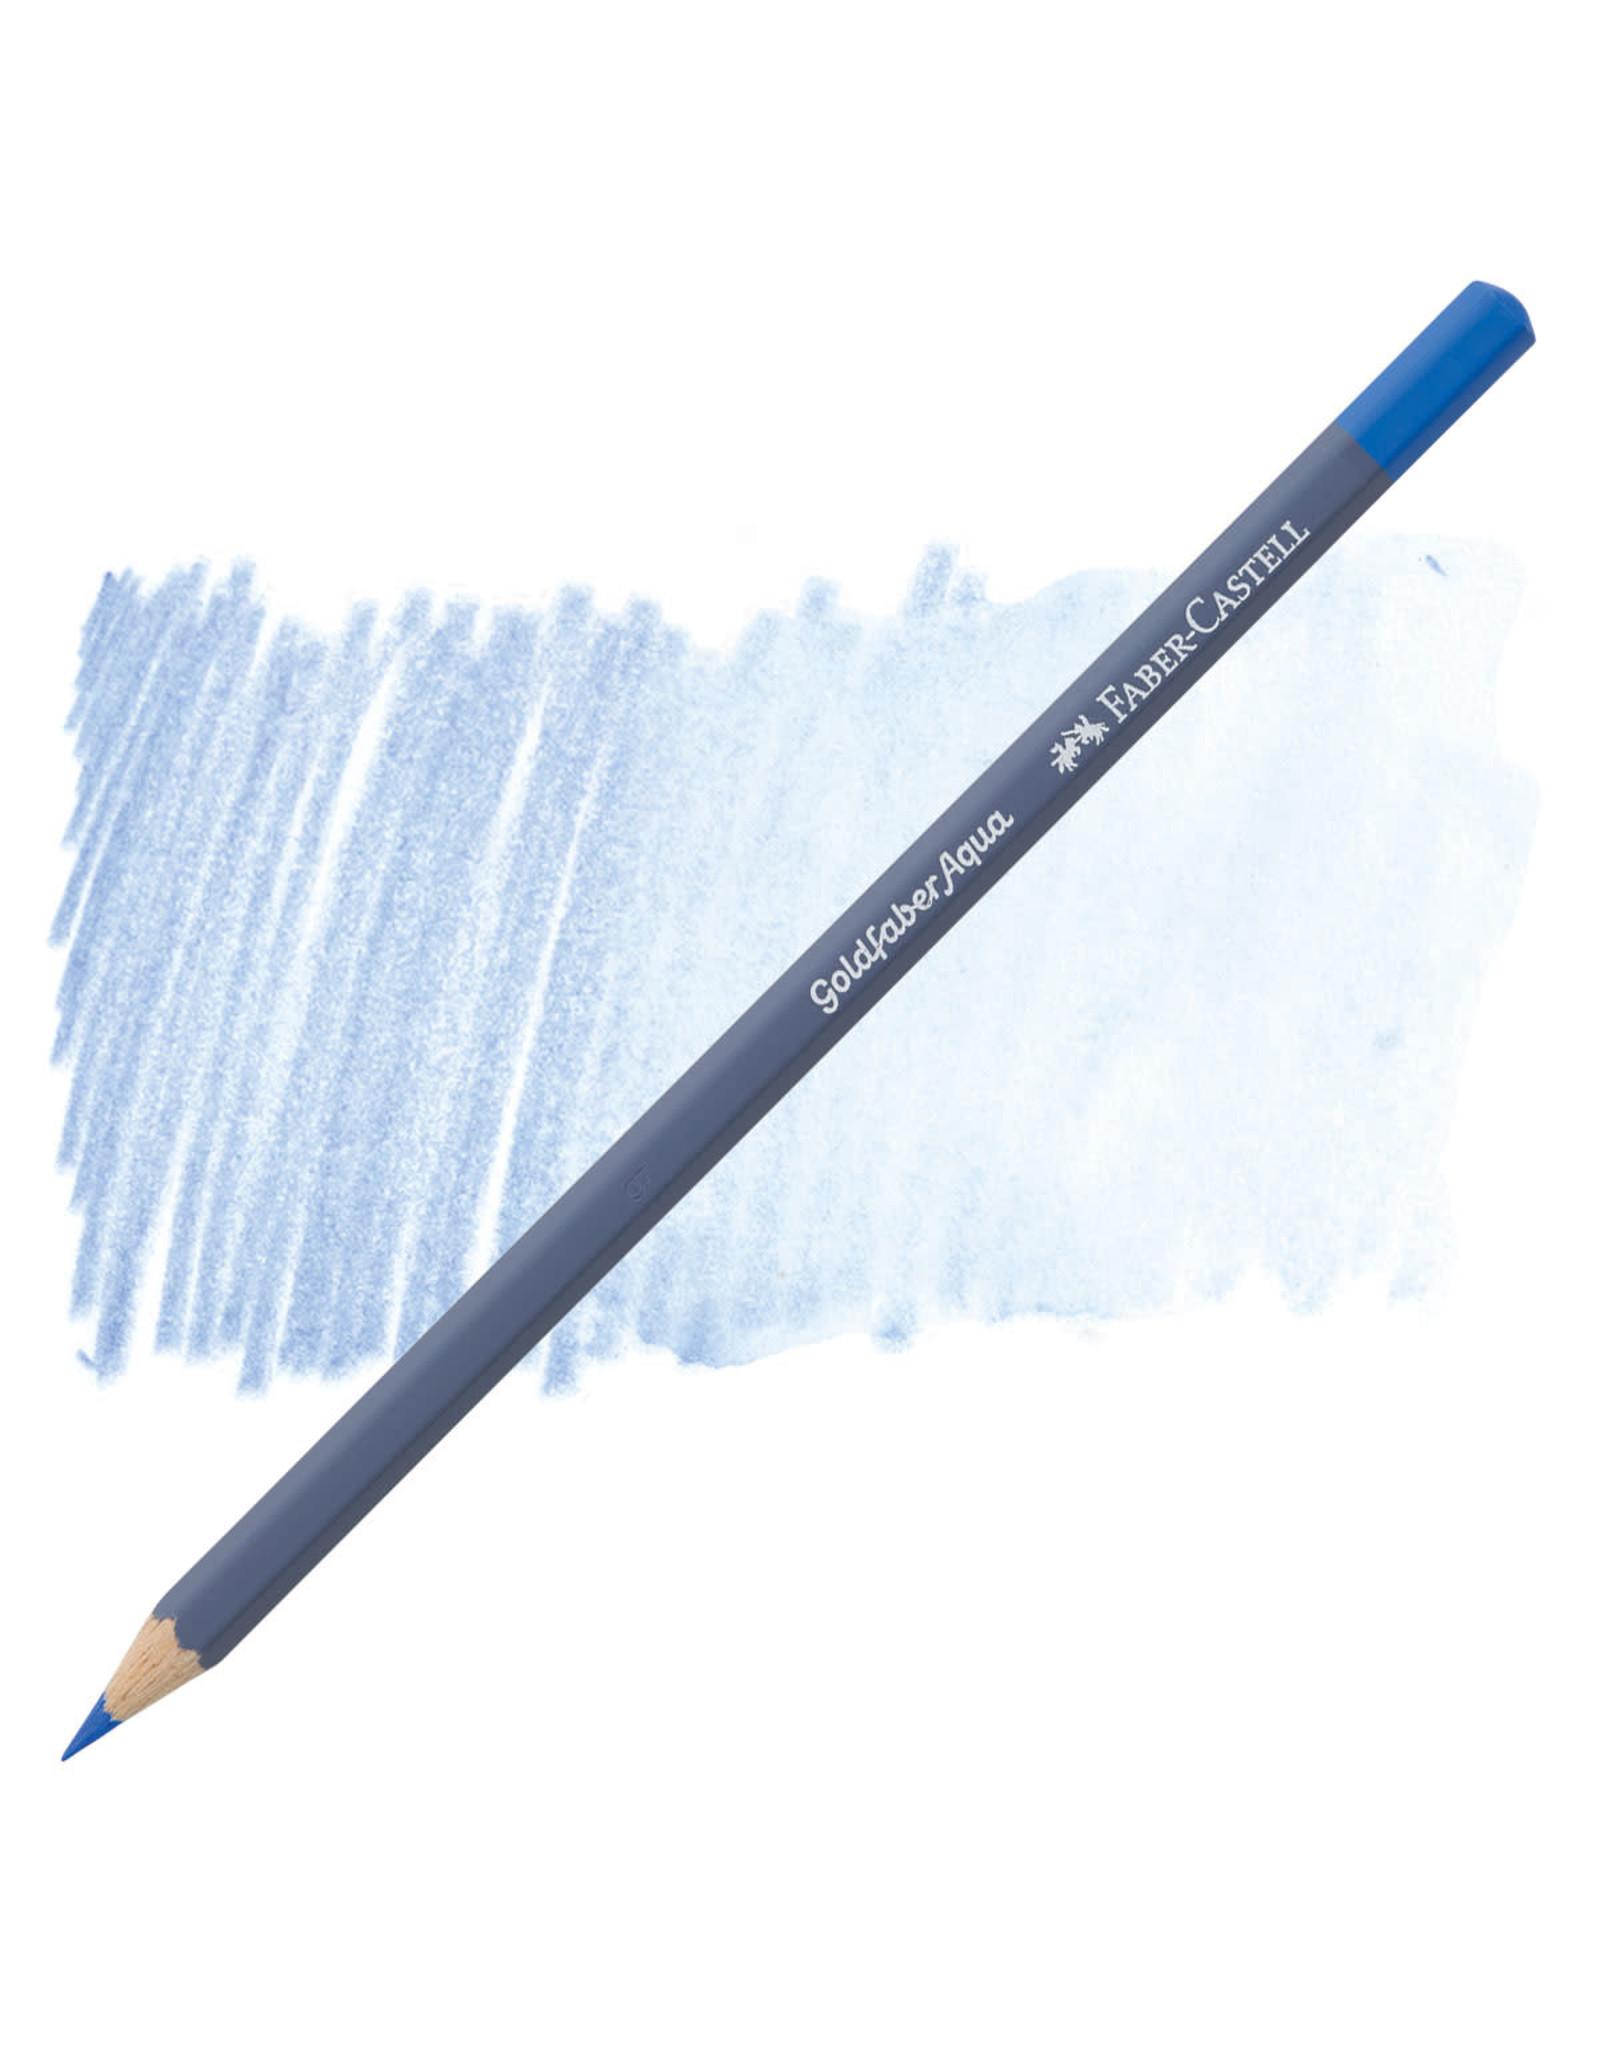 Faber-Castell Goldfaber Aqua Watercolor Pencil - Light Ultramarine #140